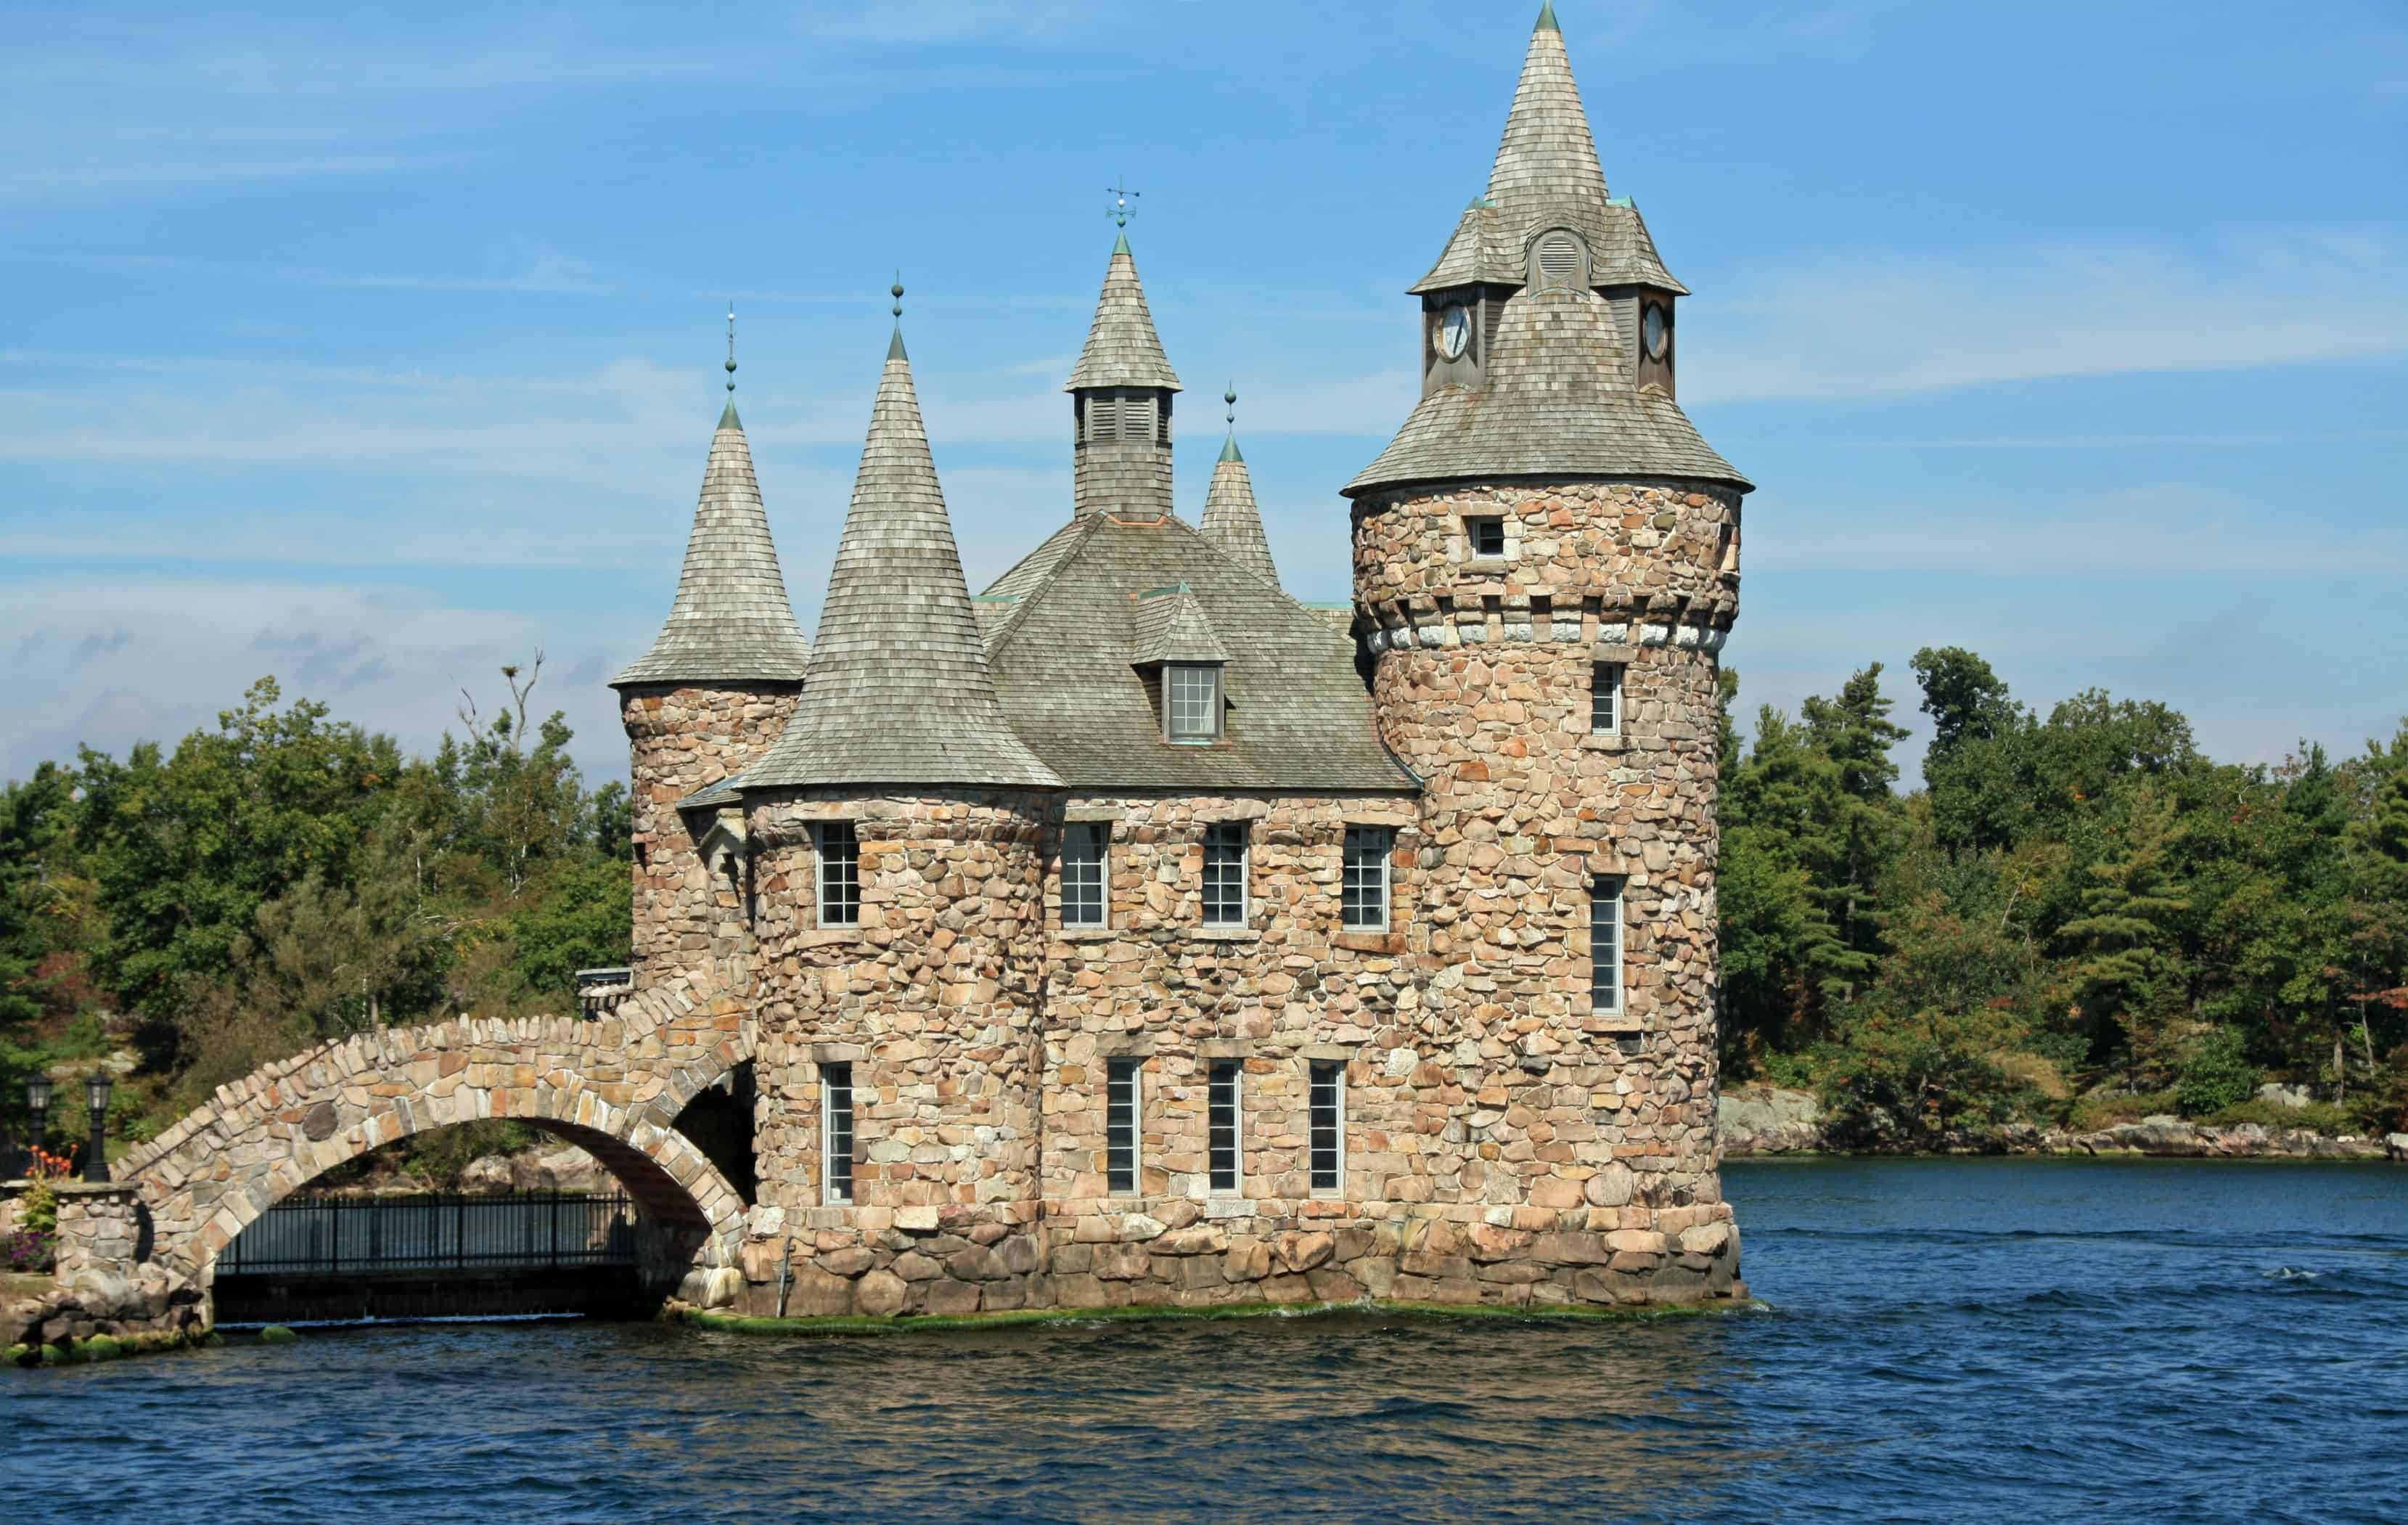 Castles in Canada